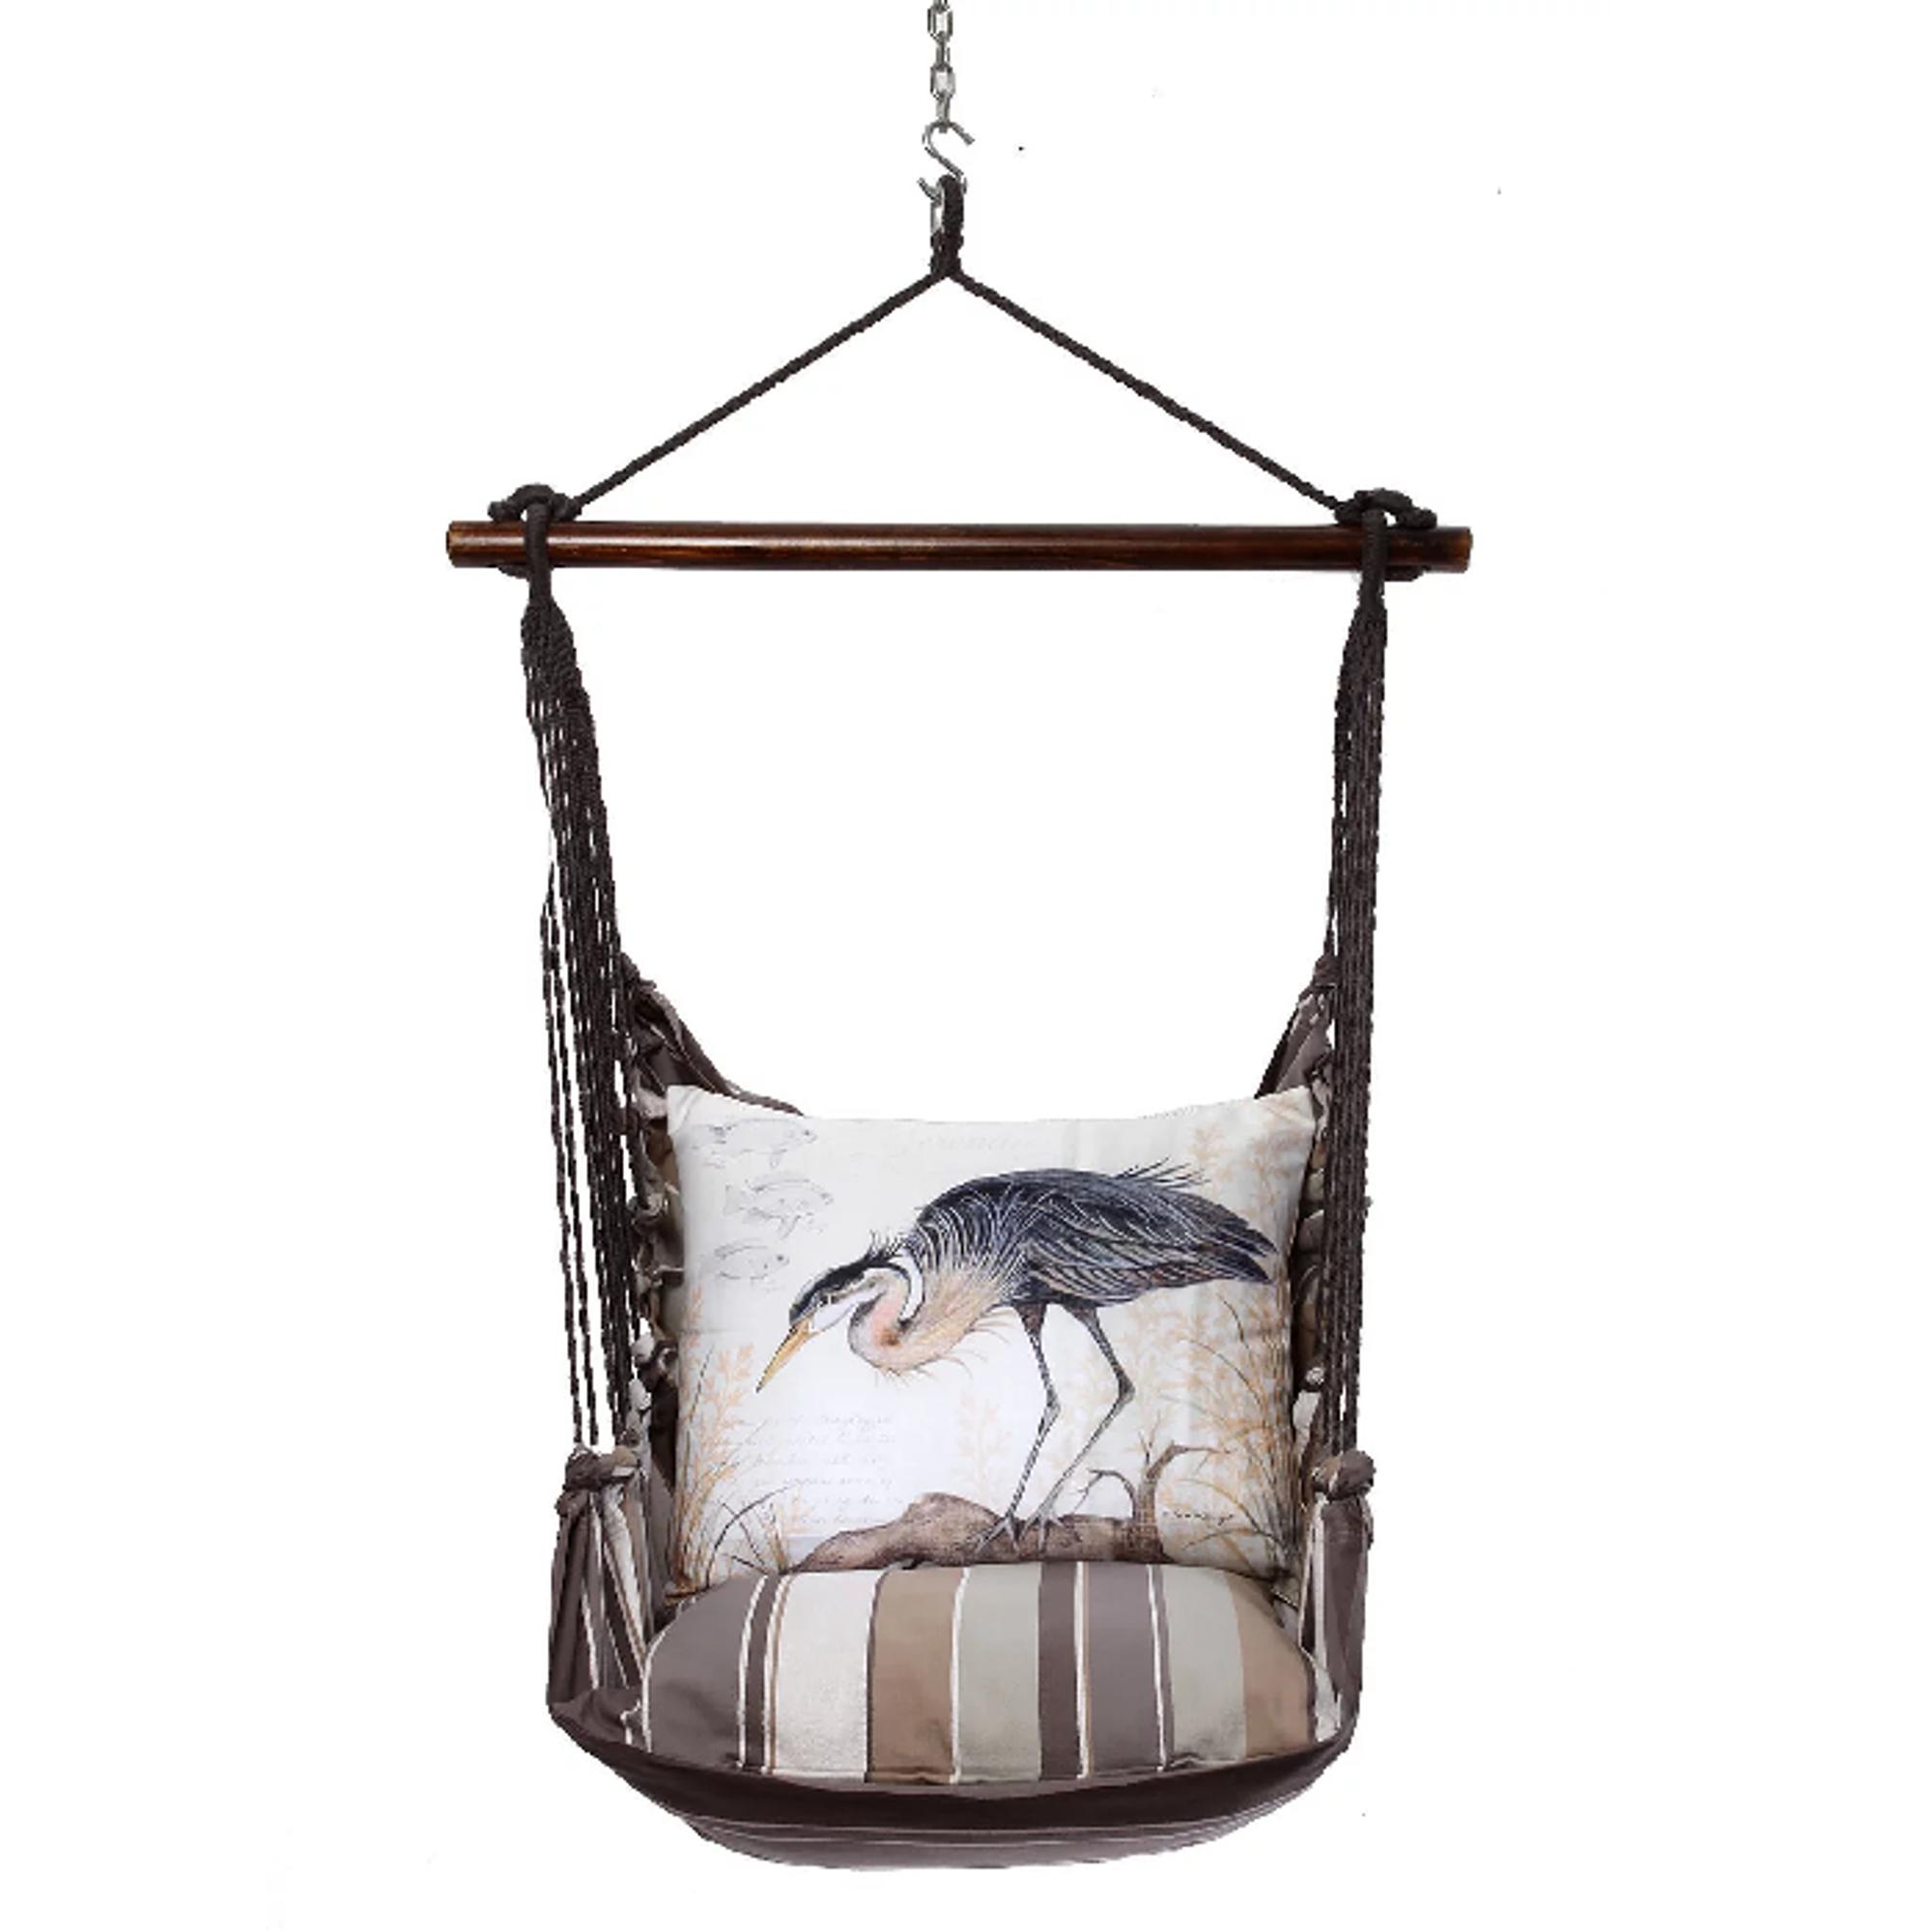 Crane Hammock Chair Swing Slate Gray